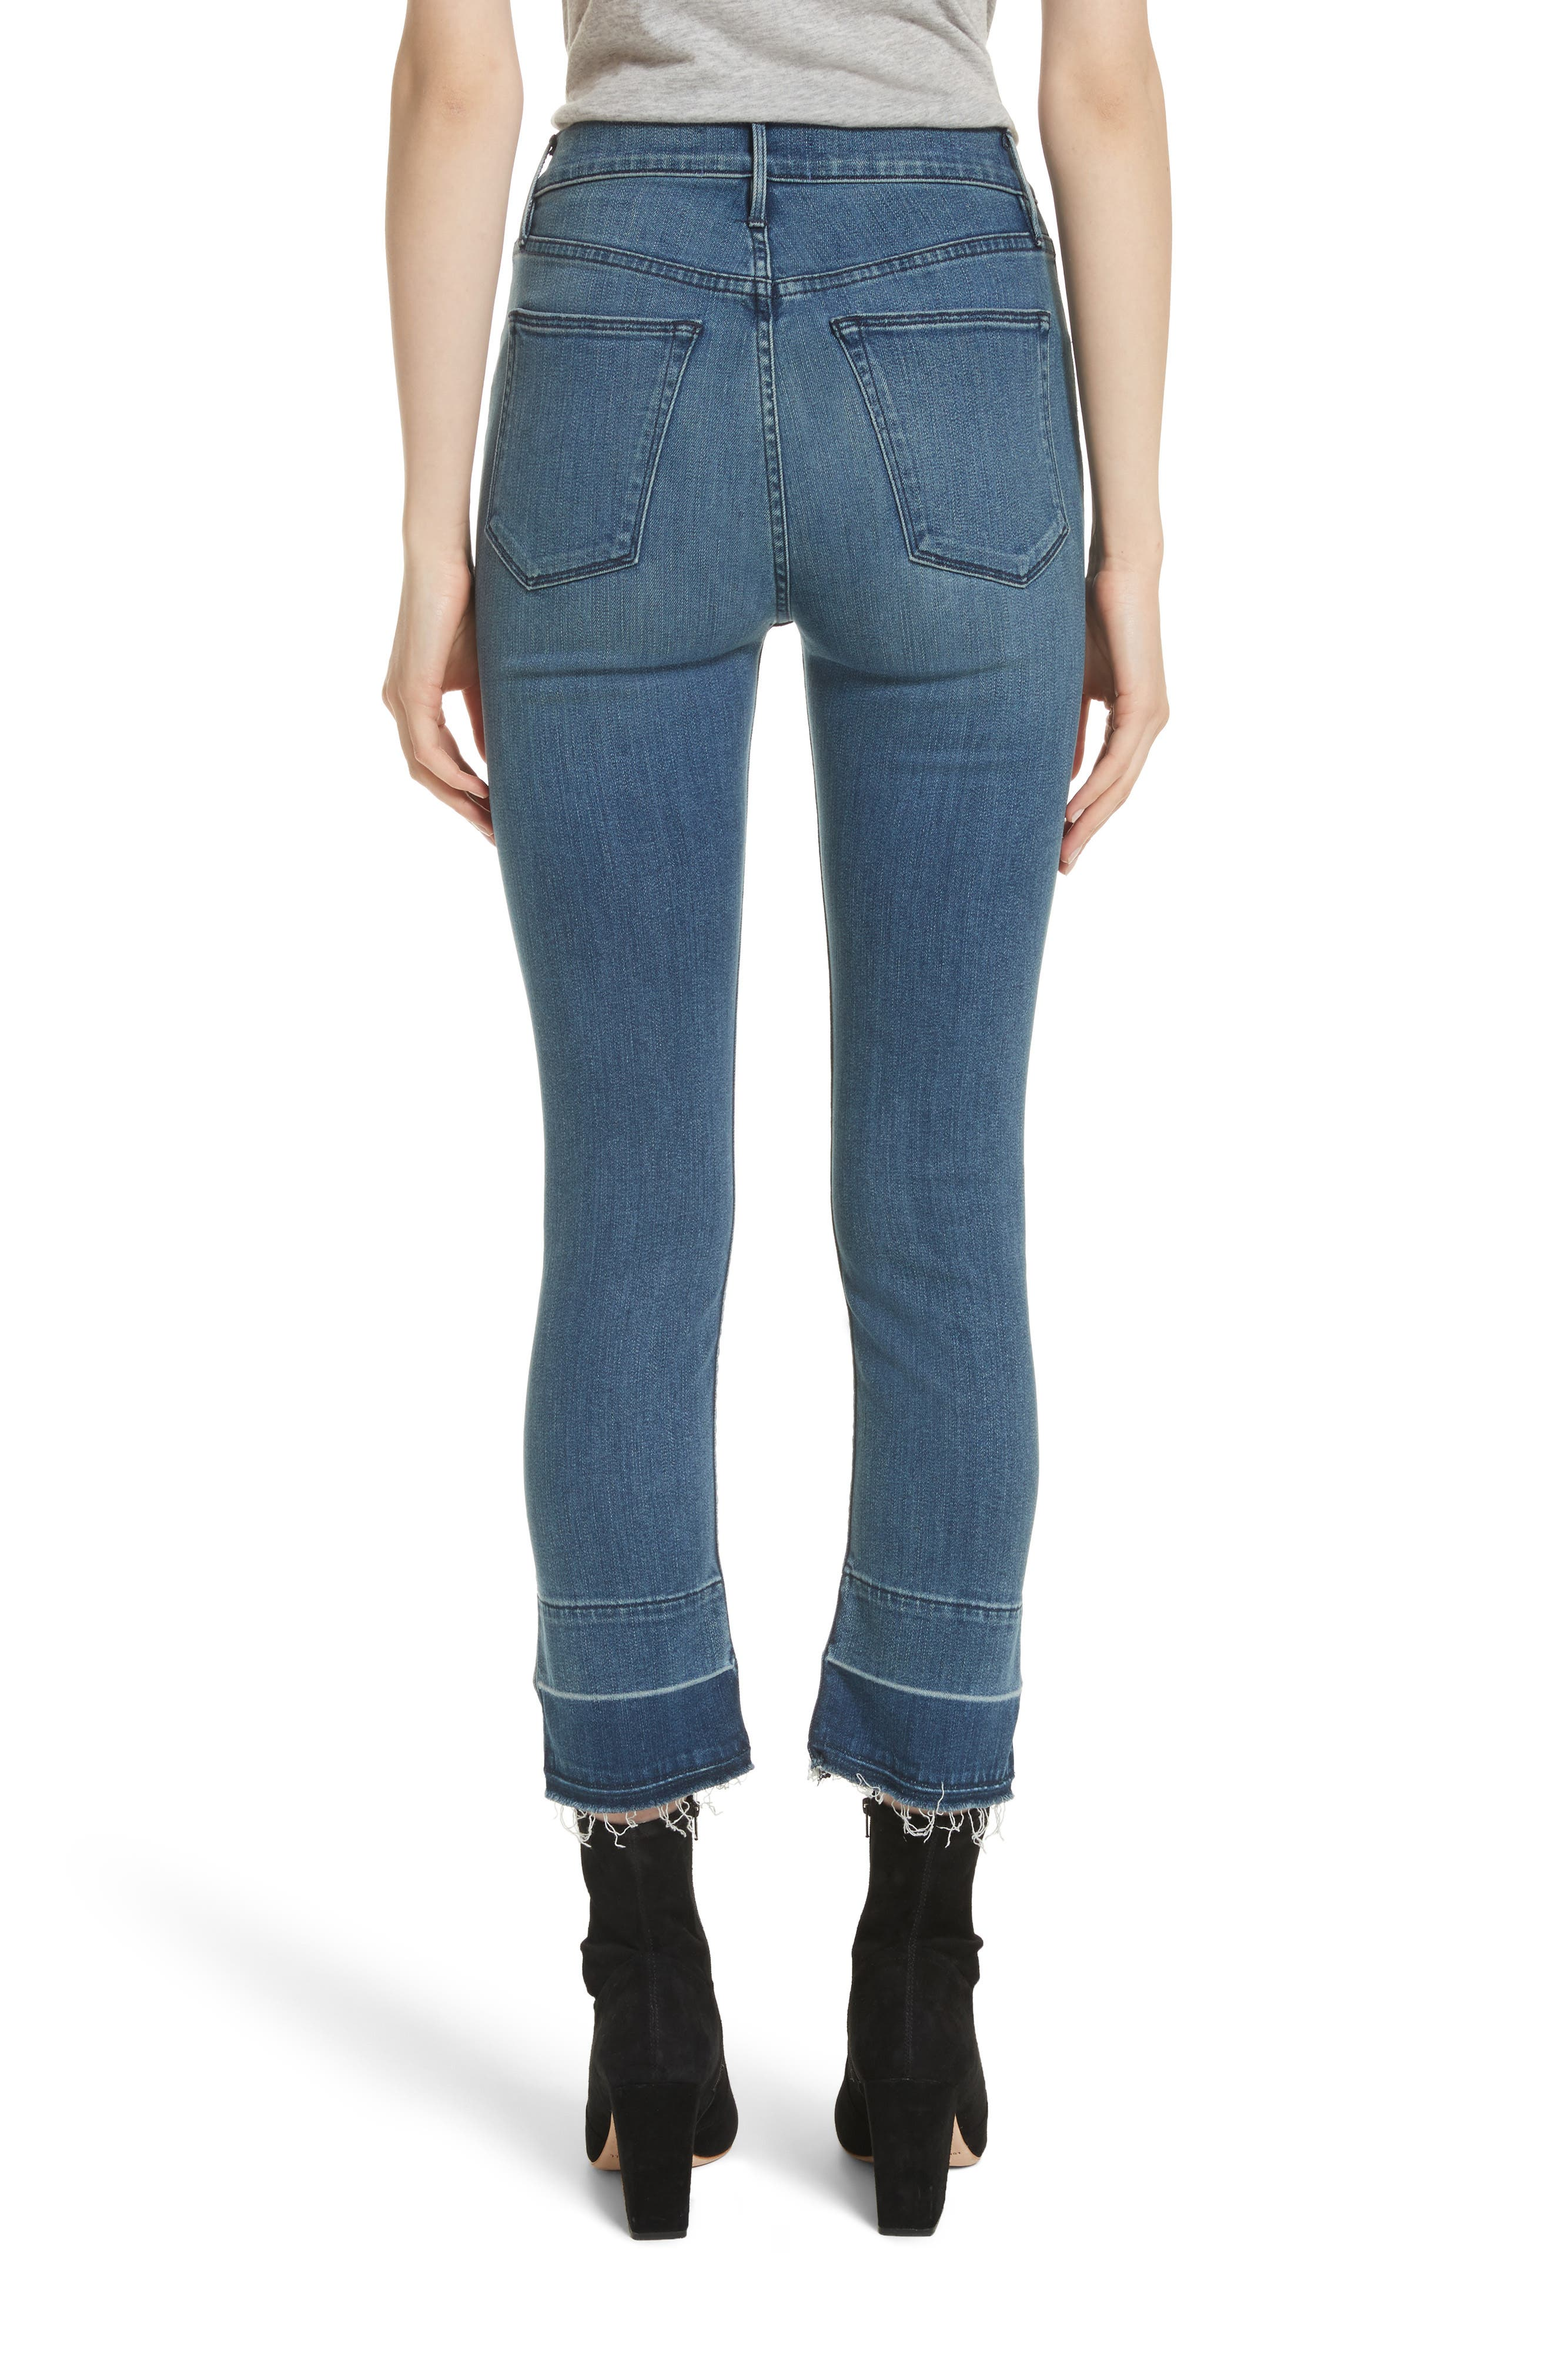 W4 Abigail Released Split Hem Ankle Skinny Jeans,                             Alternate thumbnail 2, color,                             Ady